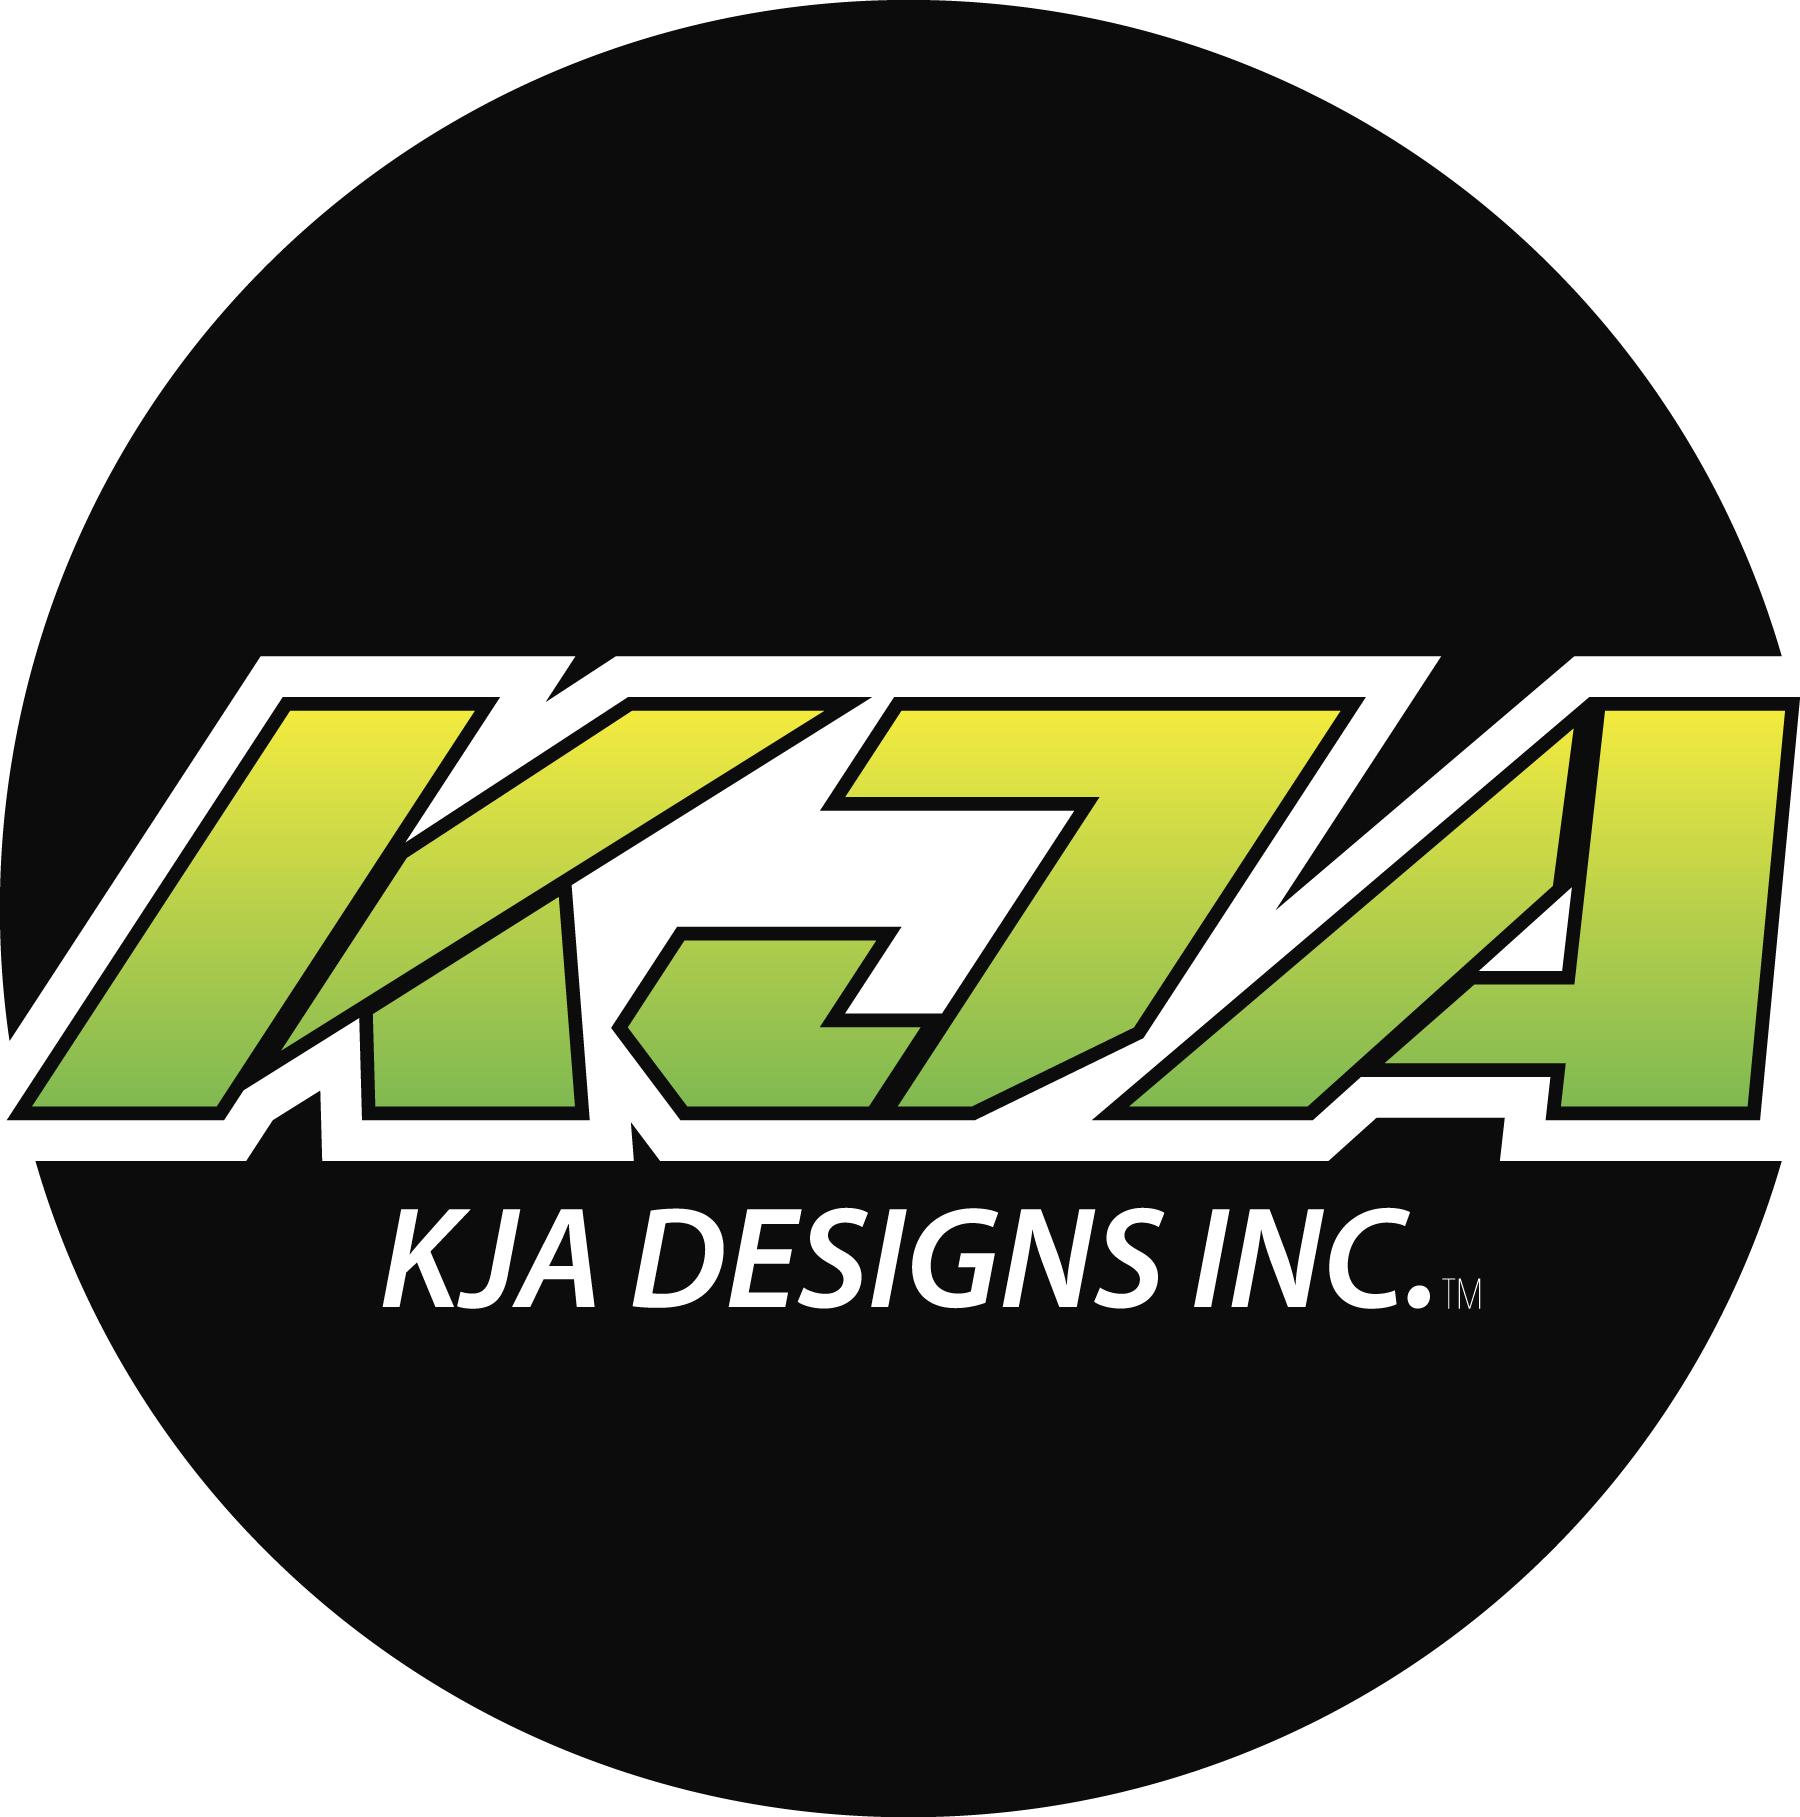 KJA Designs Inc.™ 2B on site